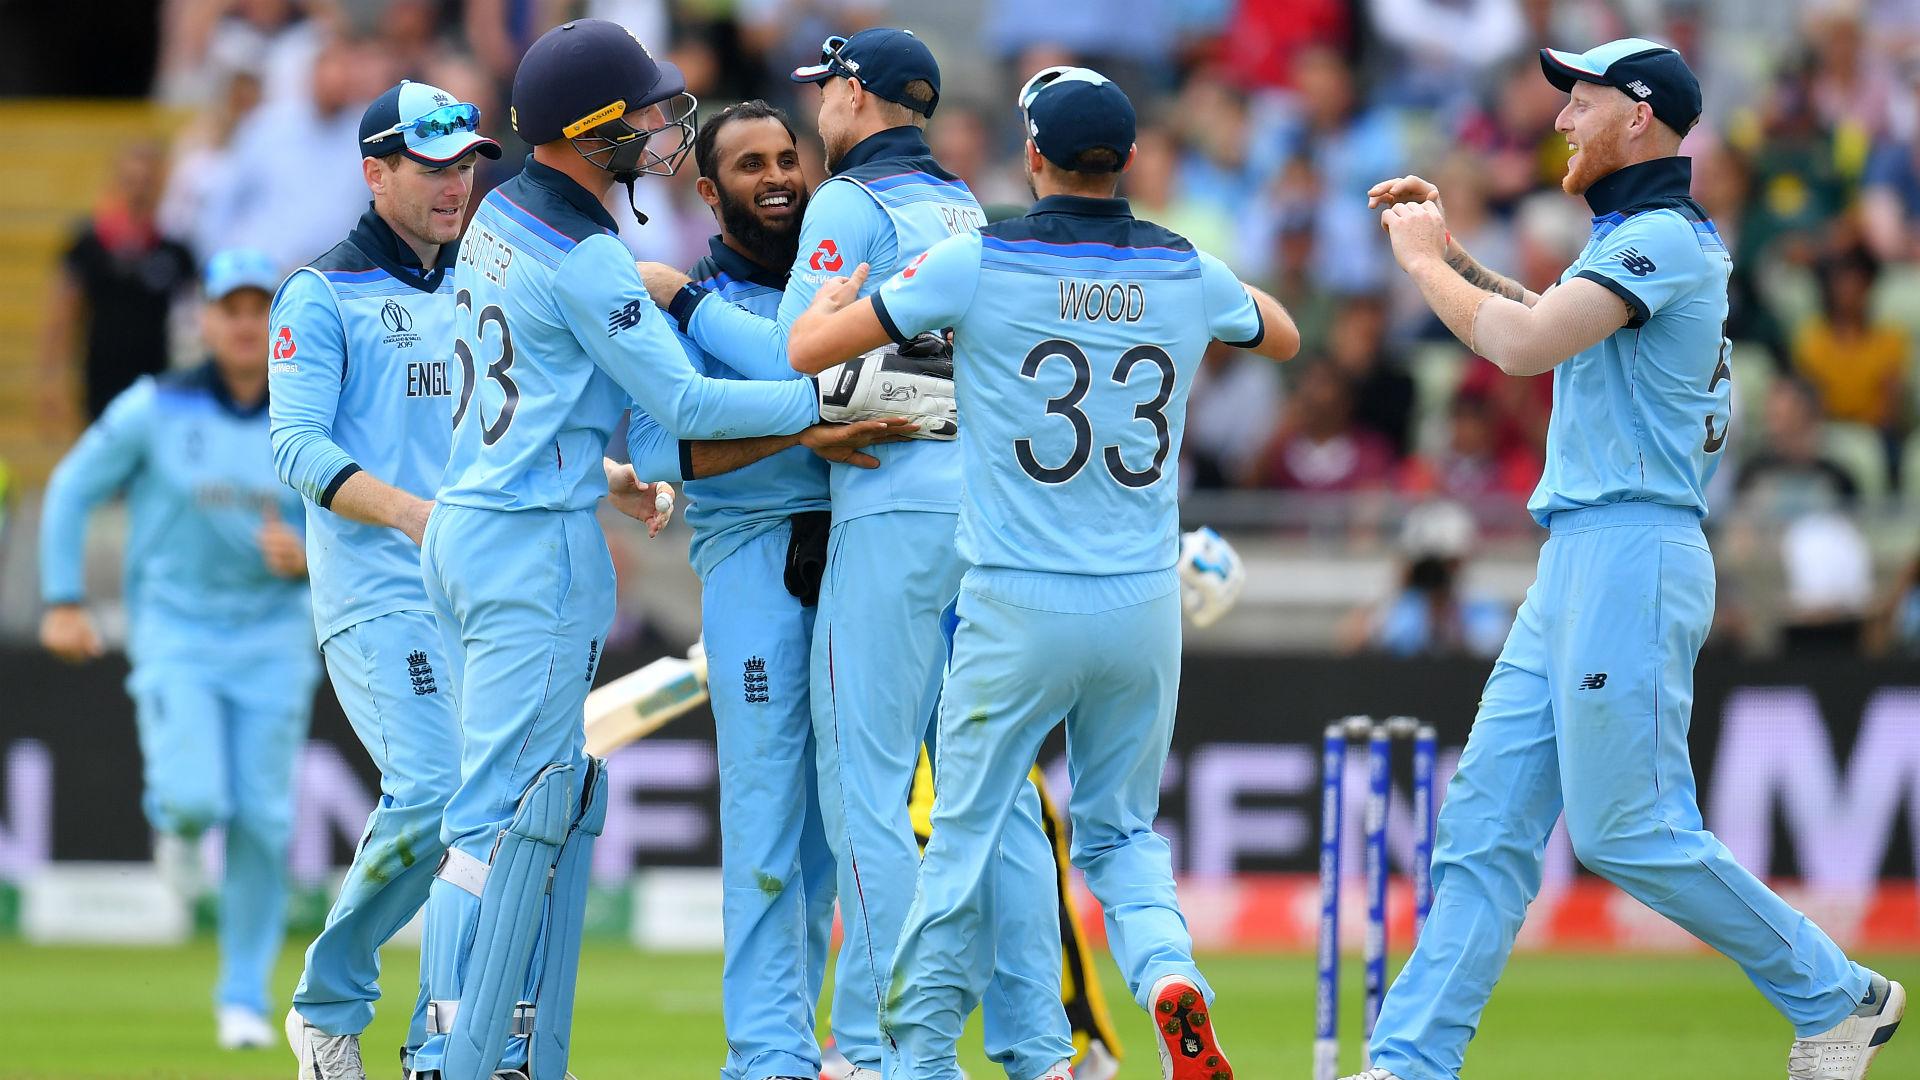 Cricket World Cup: England skittle Australia for 223 despite Smith's 85